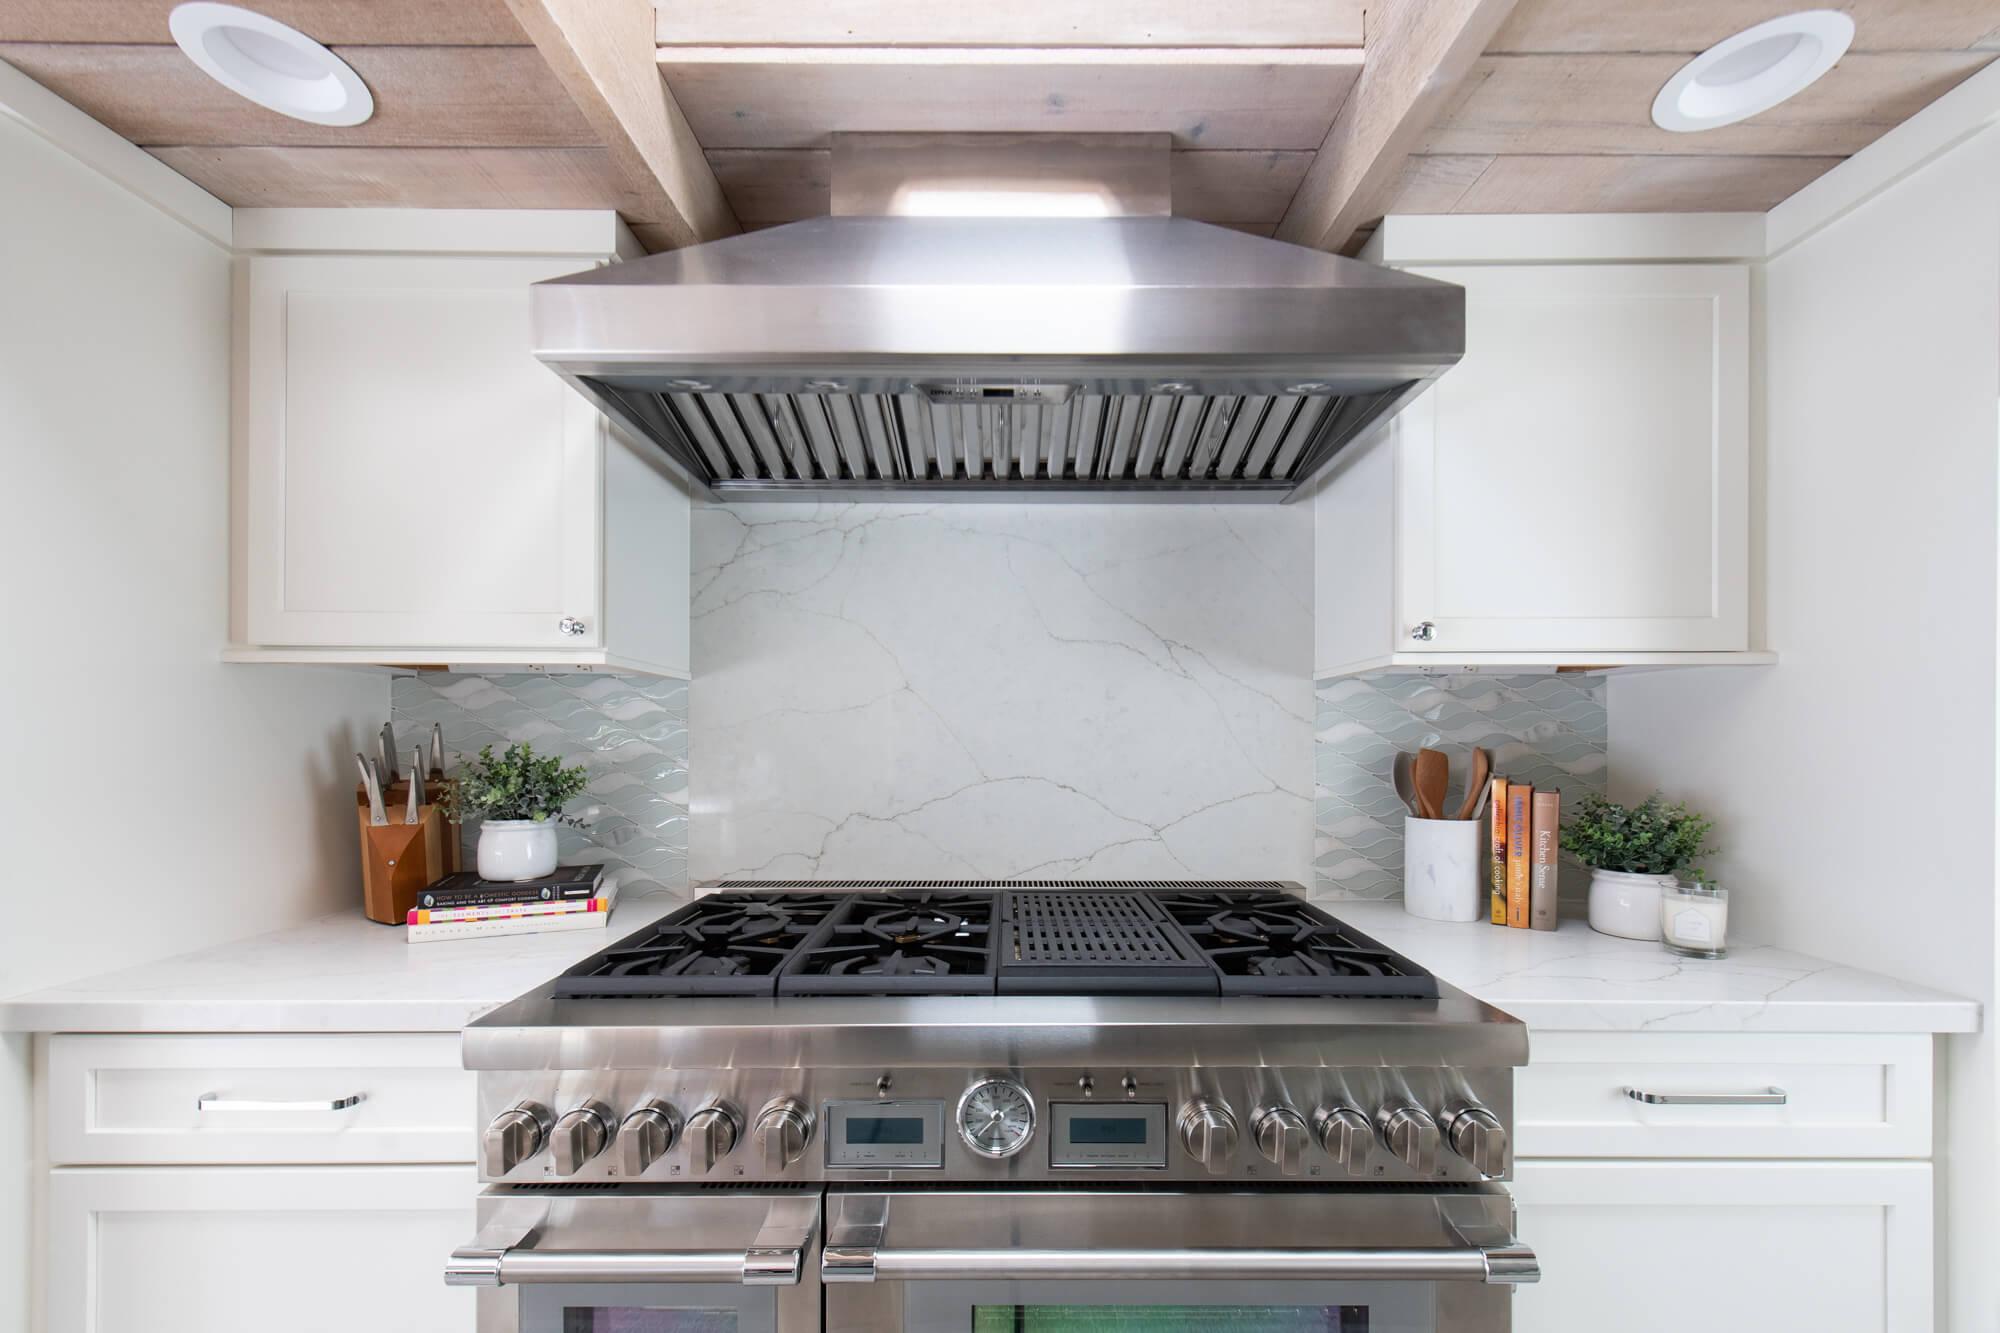 Backsplash accent in San Clemente kitchen remodel